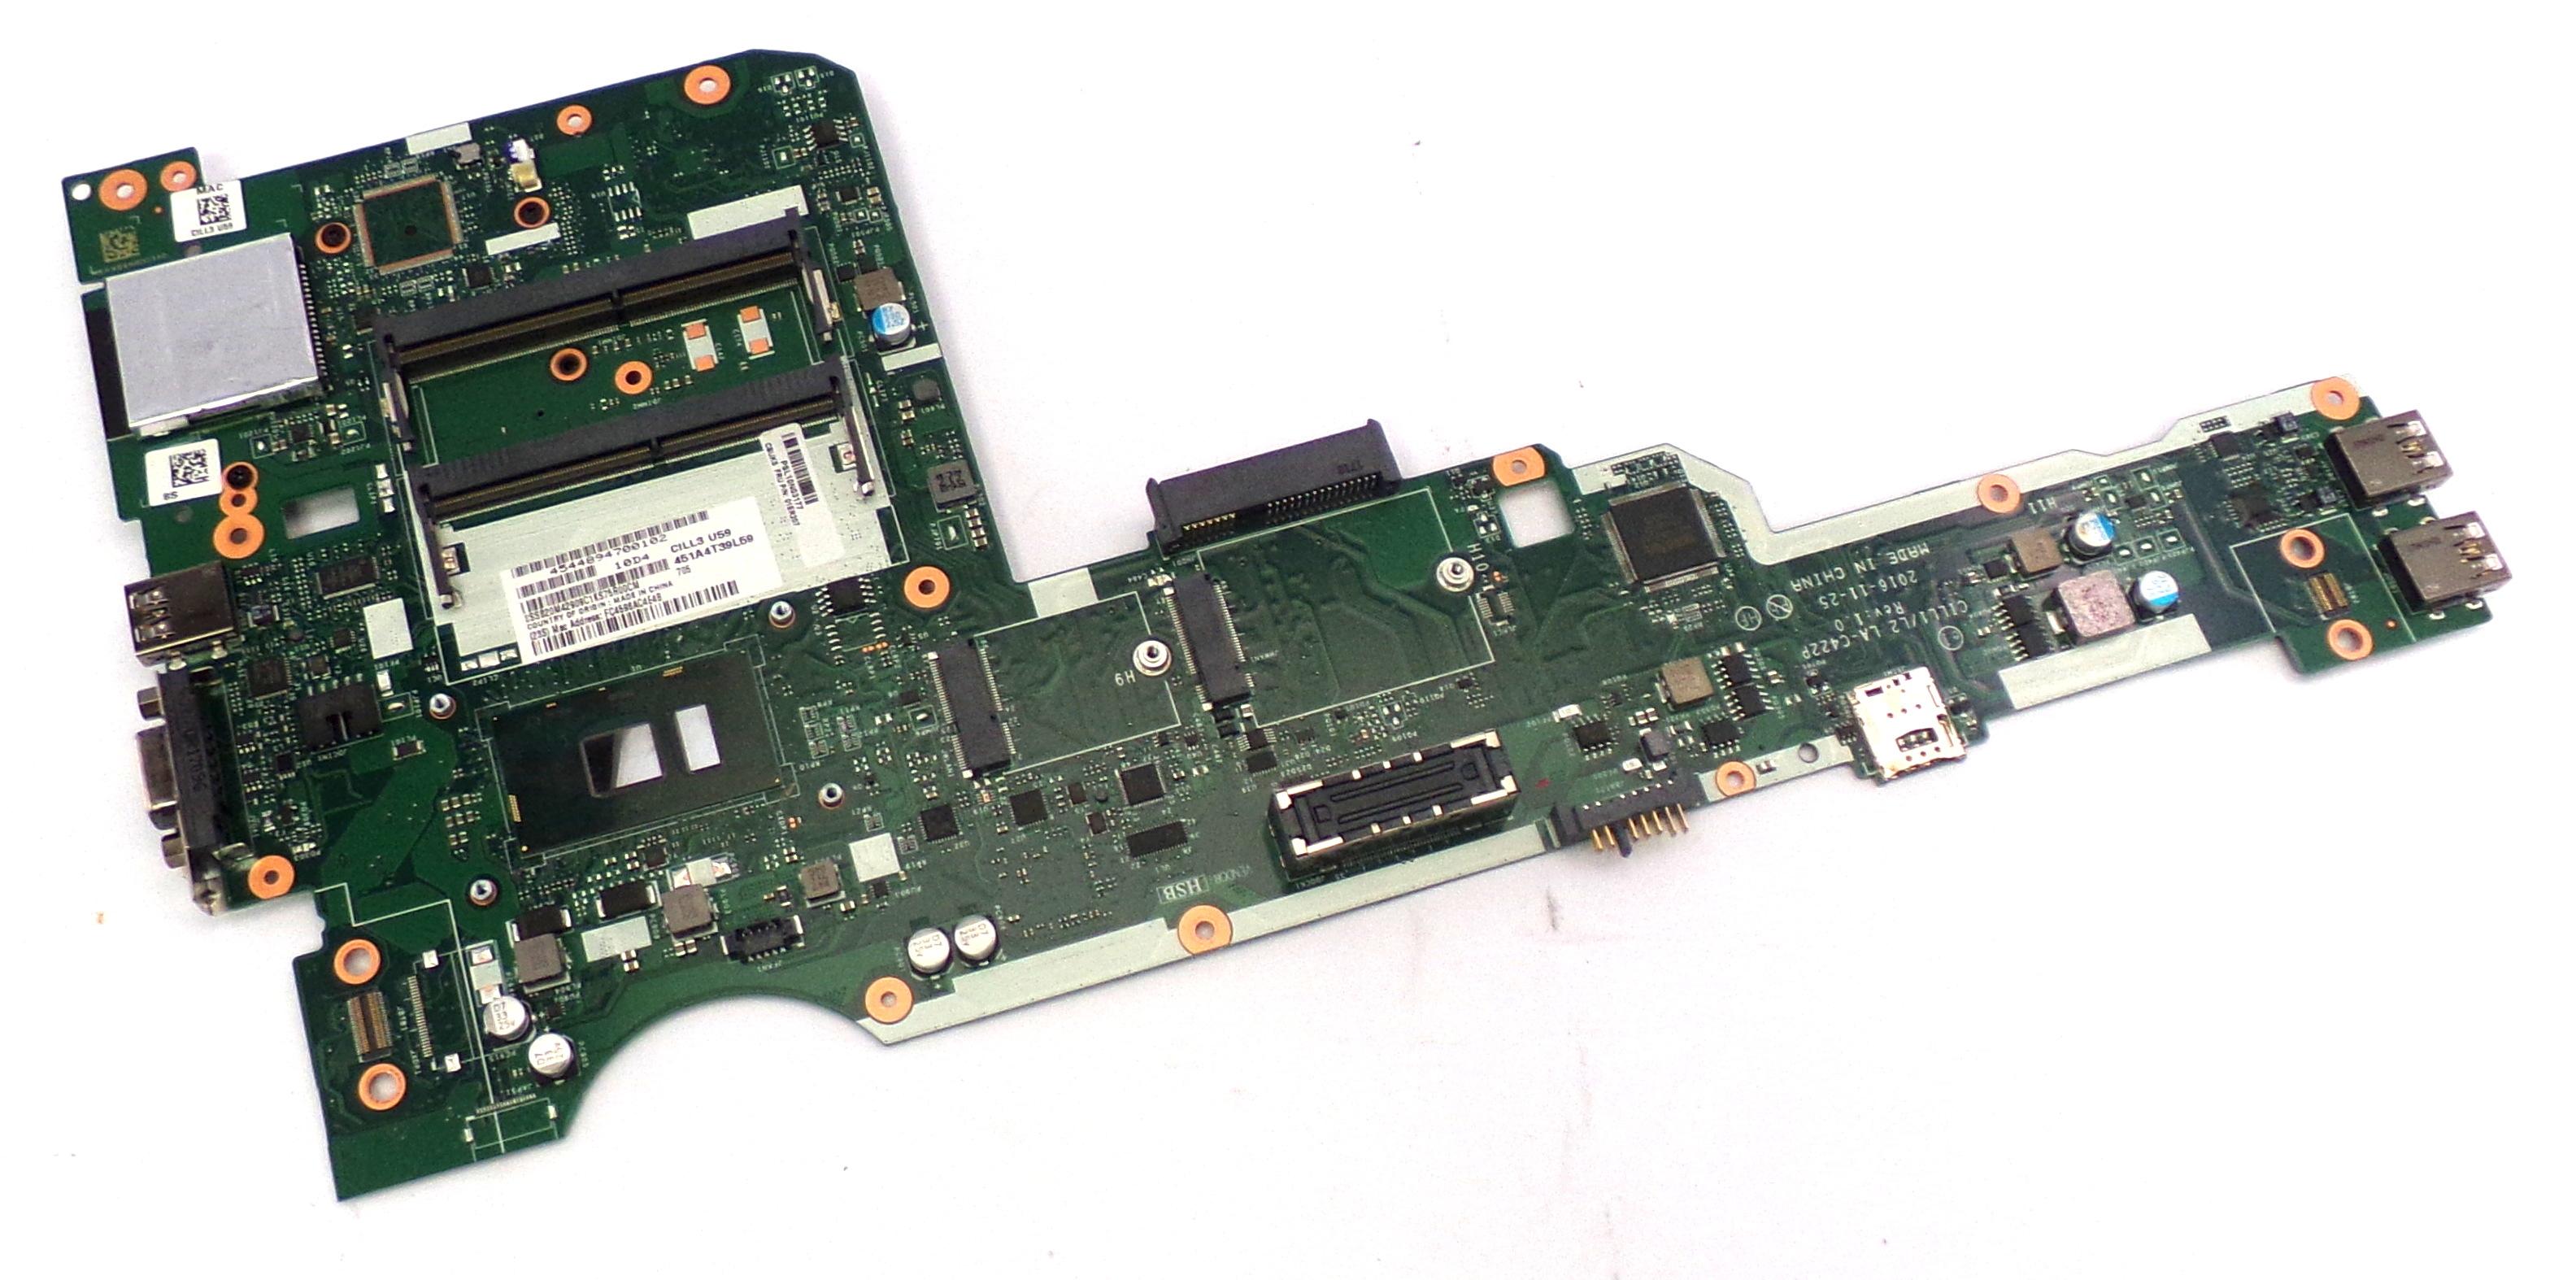 Lenovo 01ER207 ThinkPad L570 Intel Core i5-7200U Laptop Motherboard